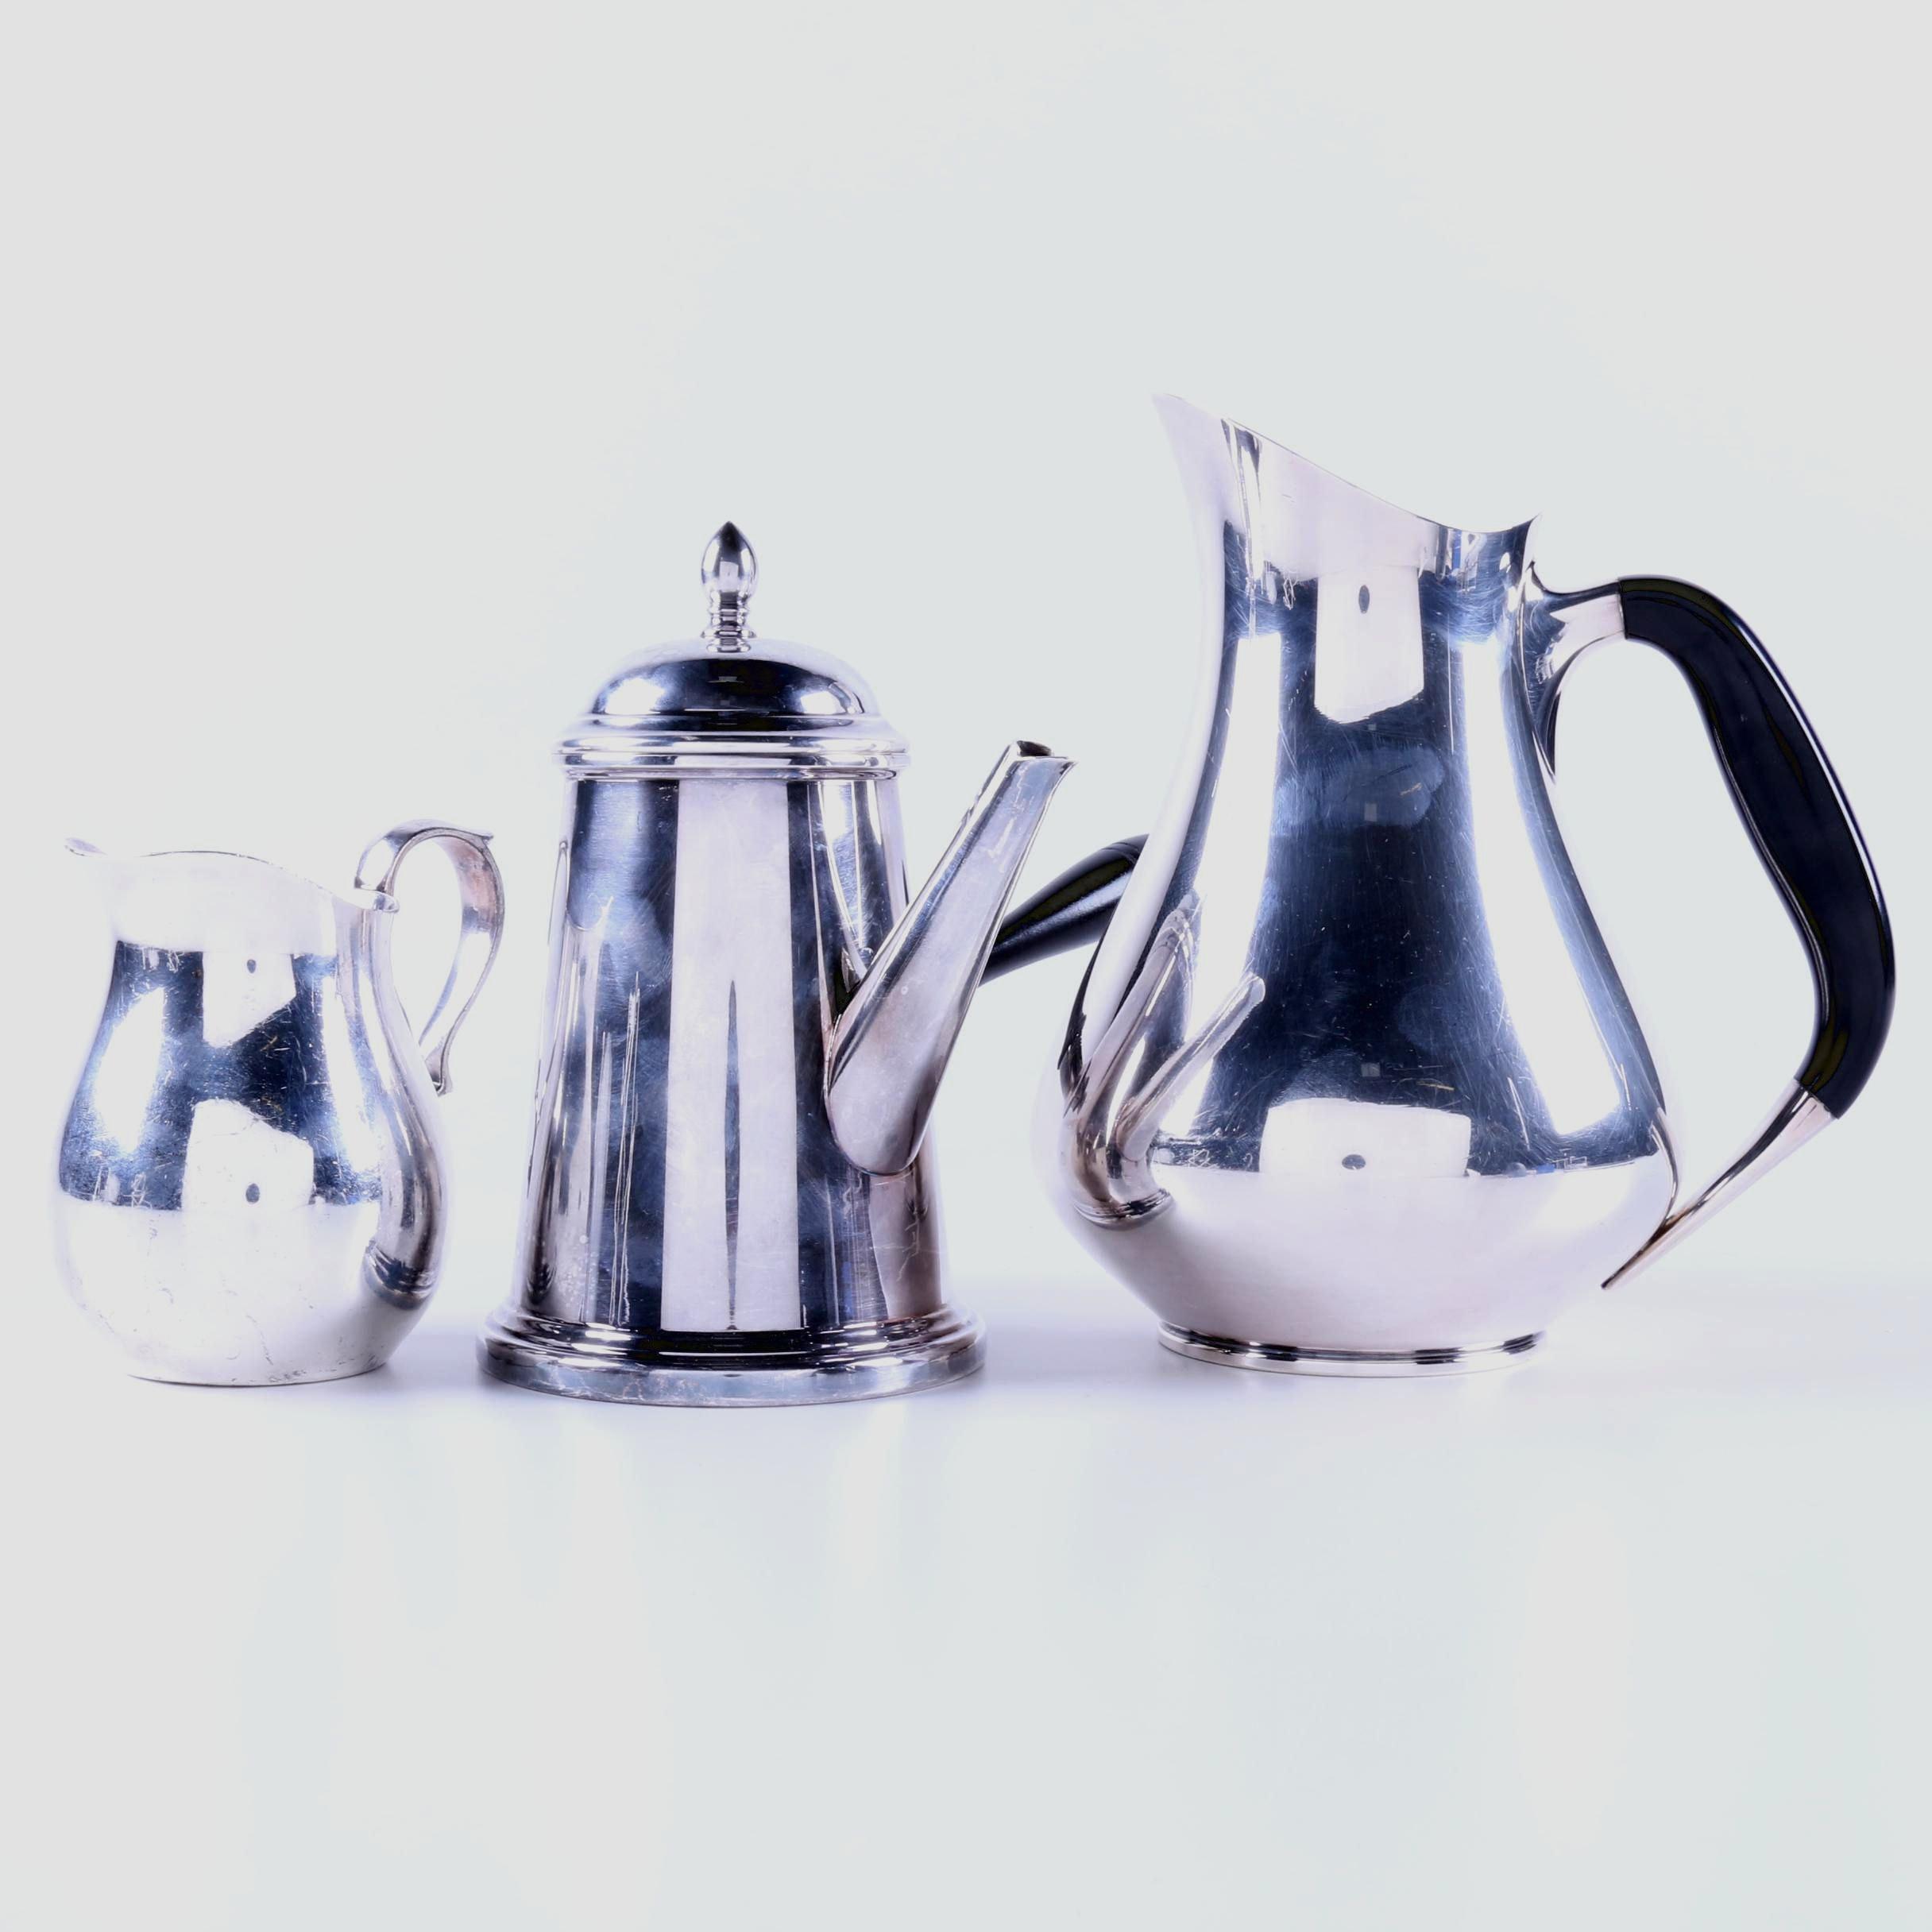 Silver Plate Servingware Featuring Friedman Silver Co.